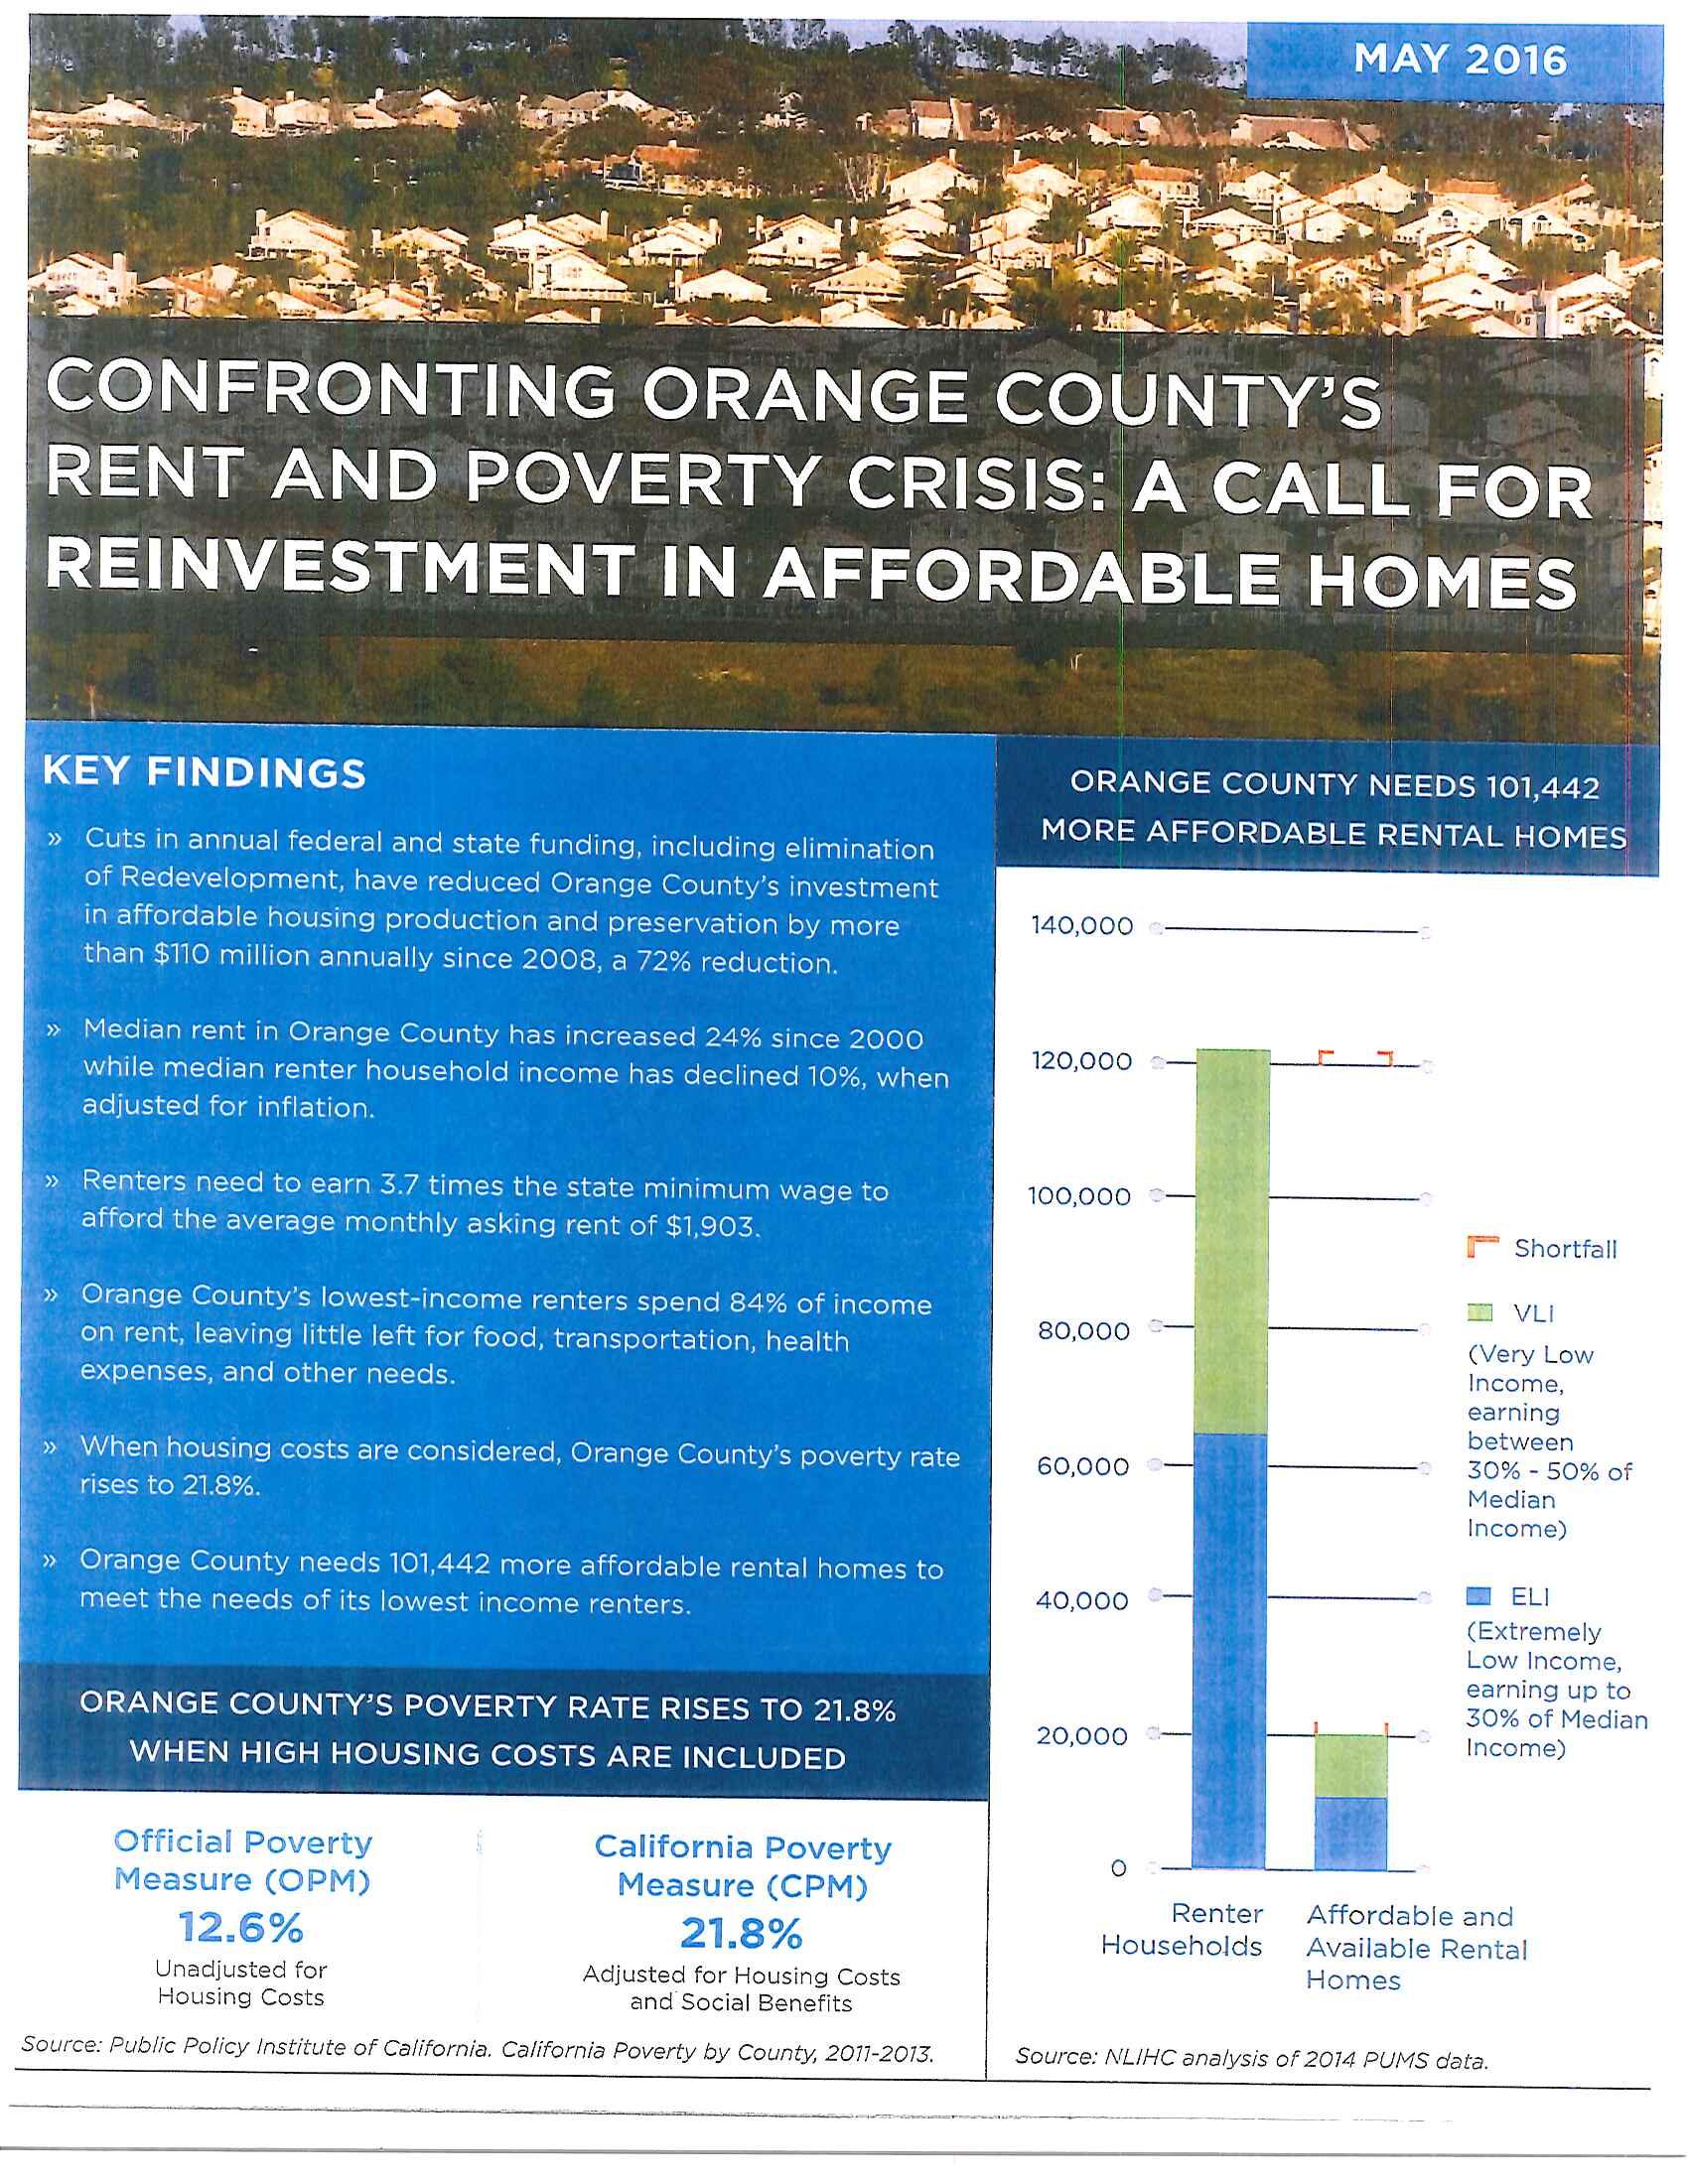 OC Affordable Housing Crisis data_Part1.jpg